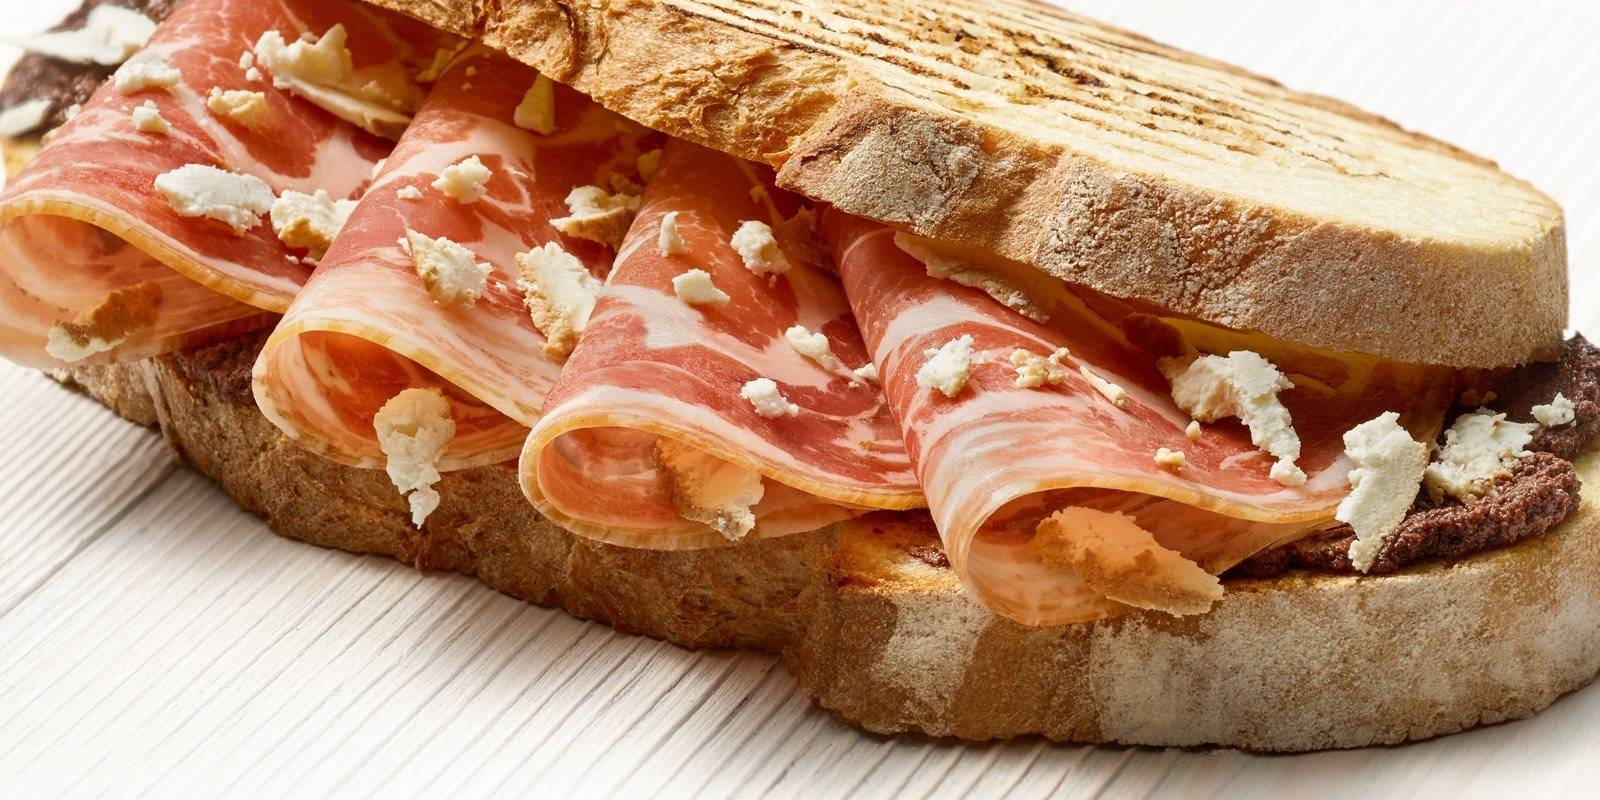 levoni_emozionale_ricetta_boccone_sardo_pancetta